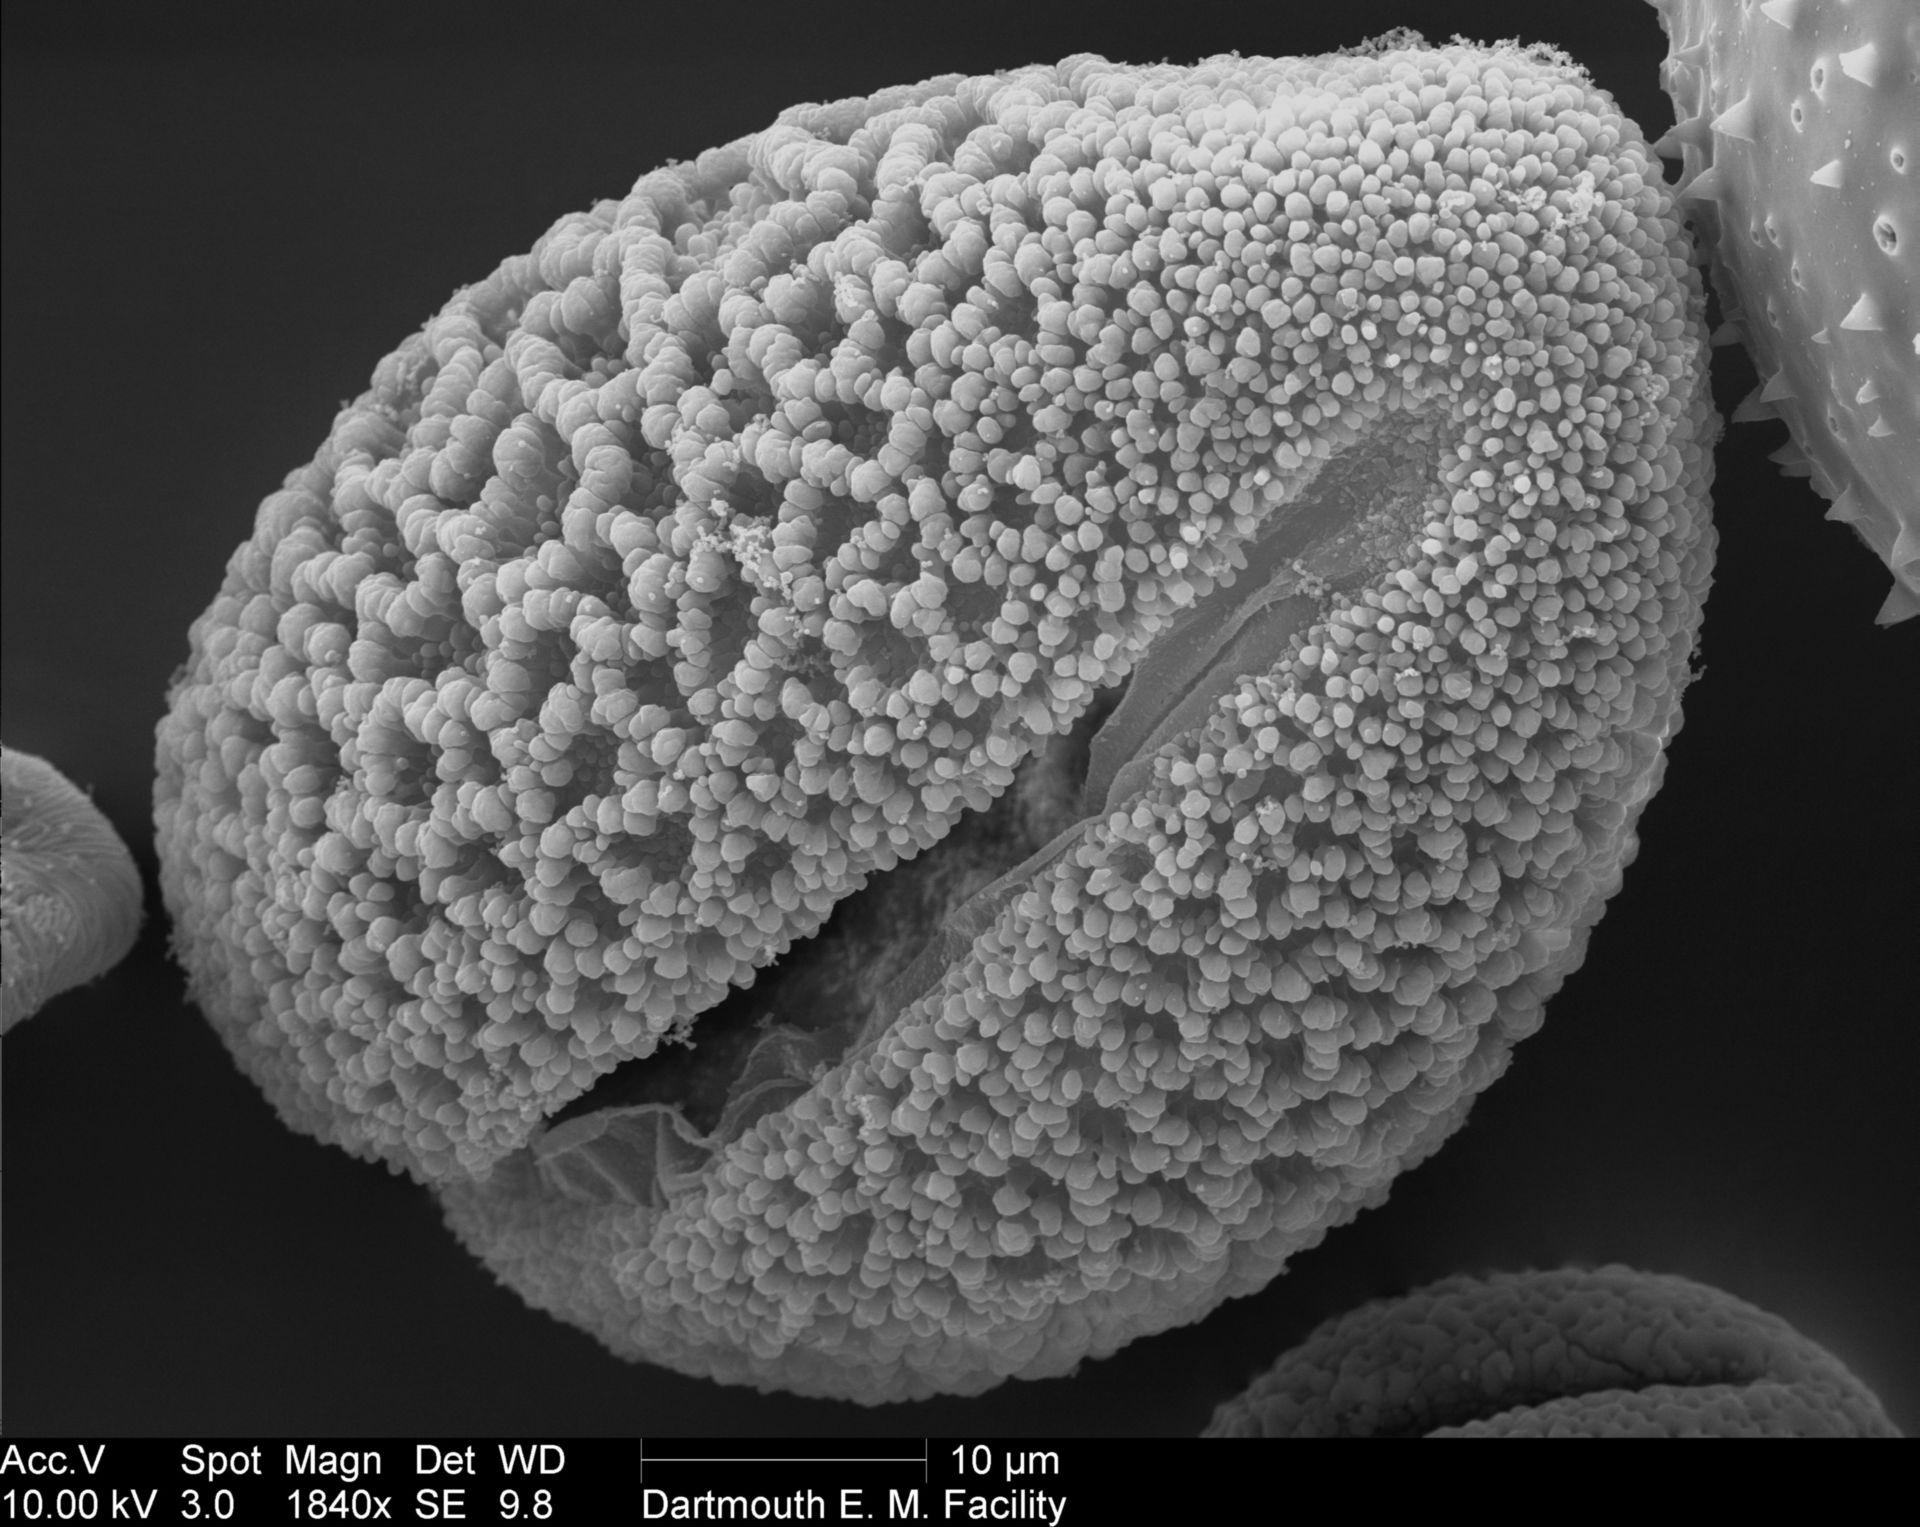 Lilium longiflorum (Pollen wall) - CIL:40332